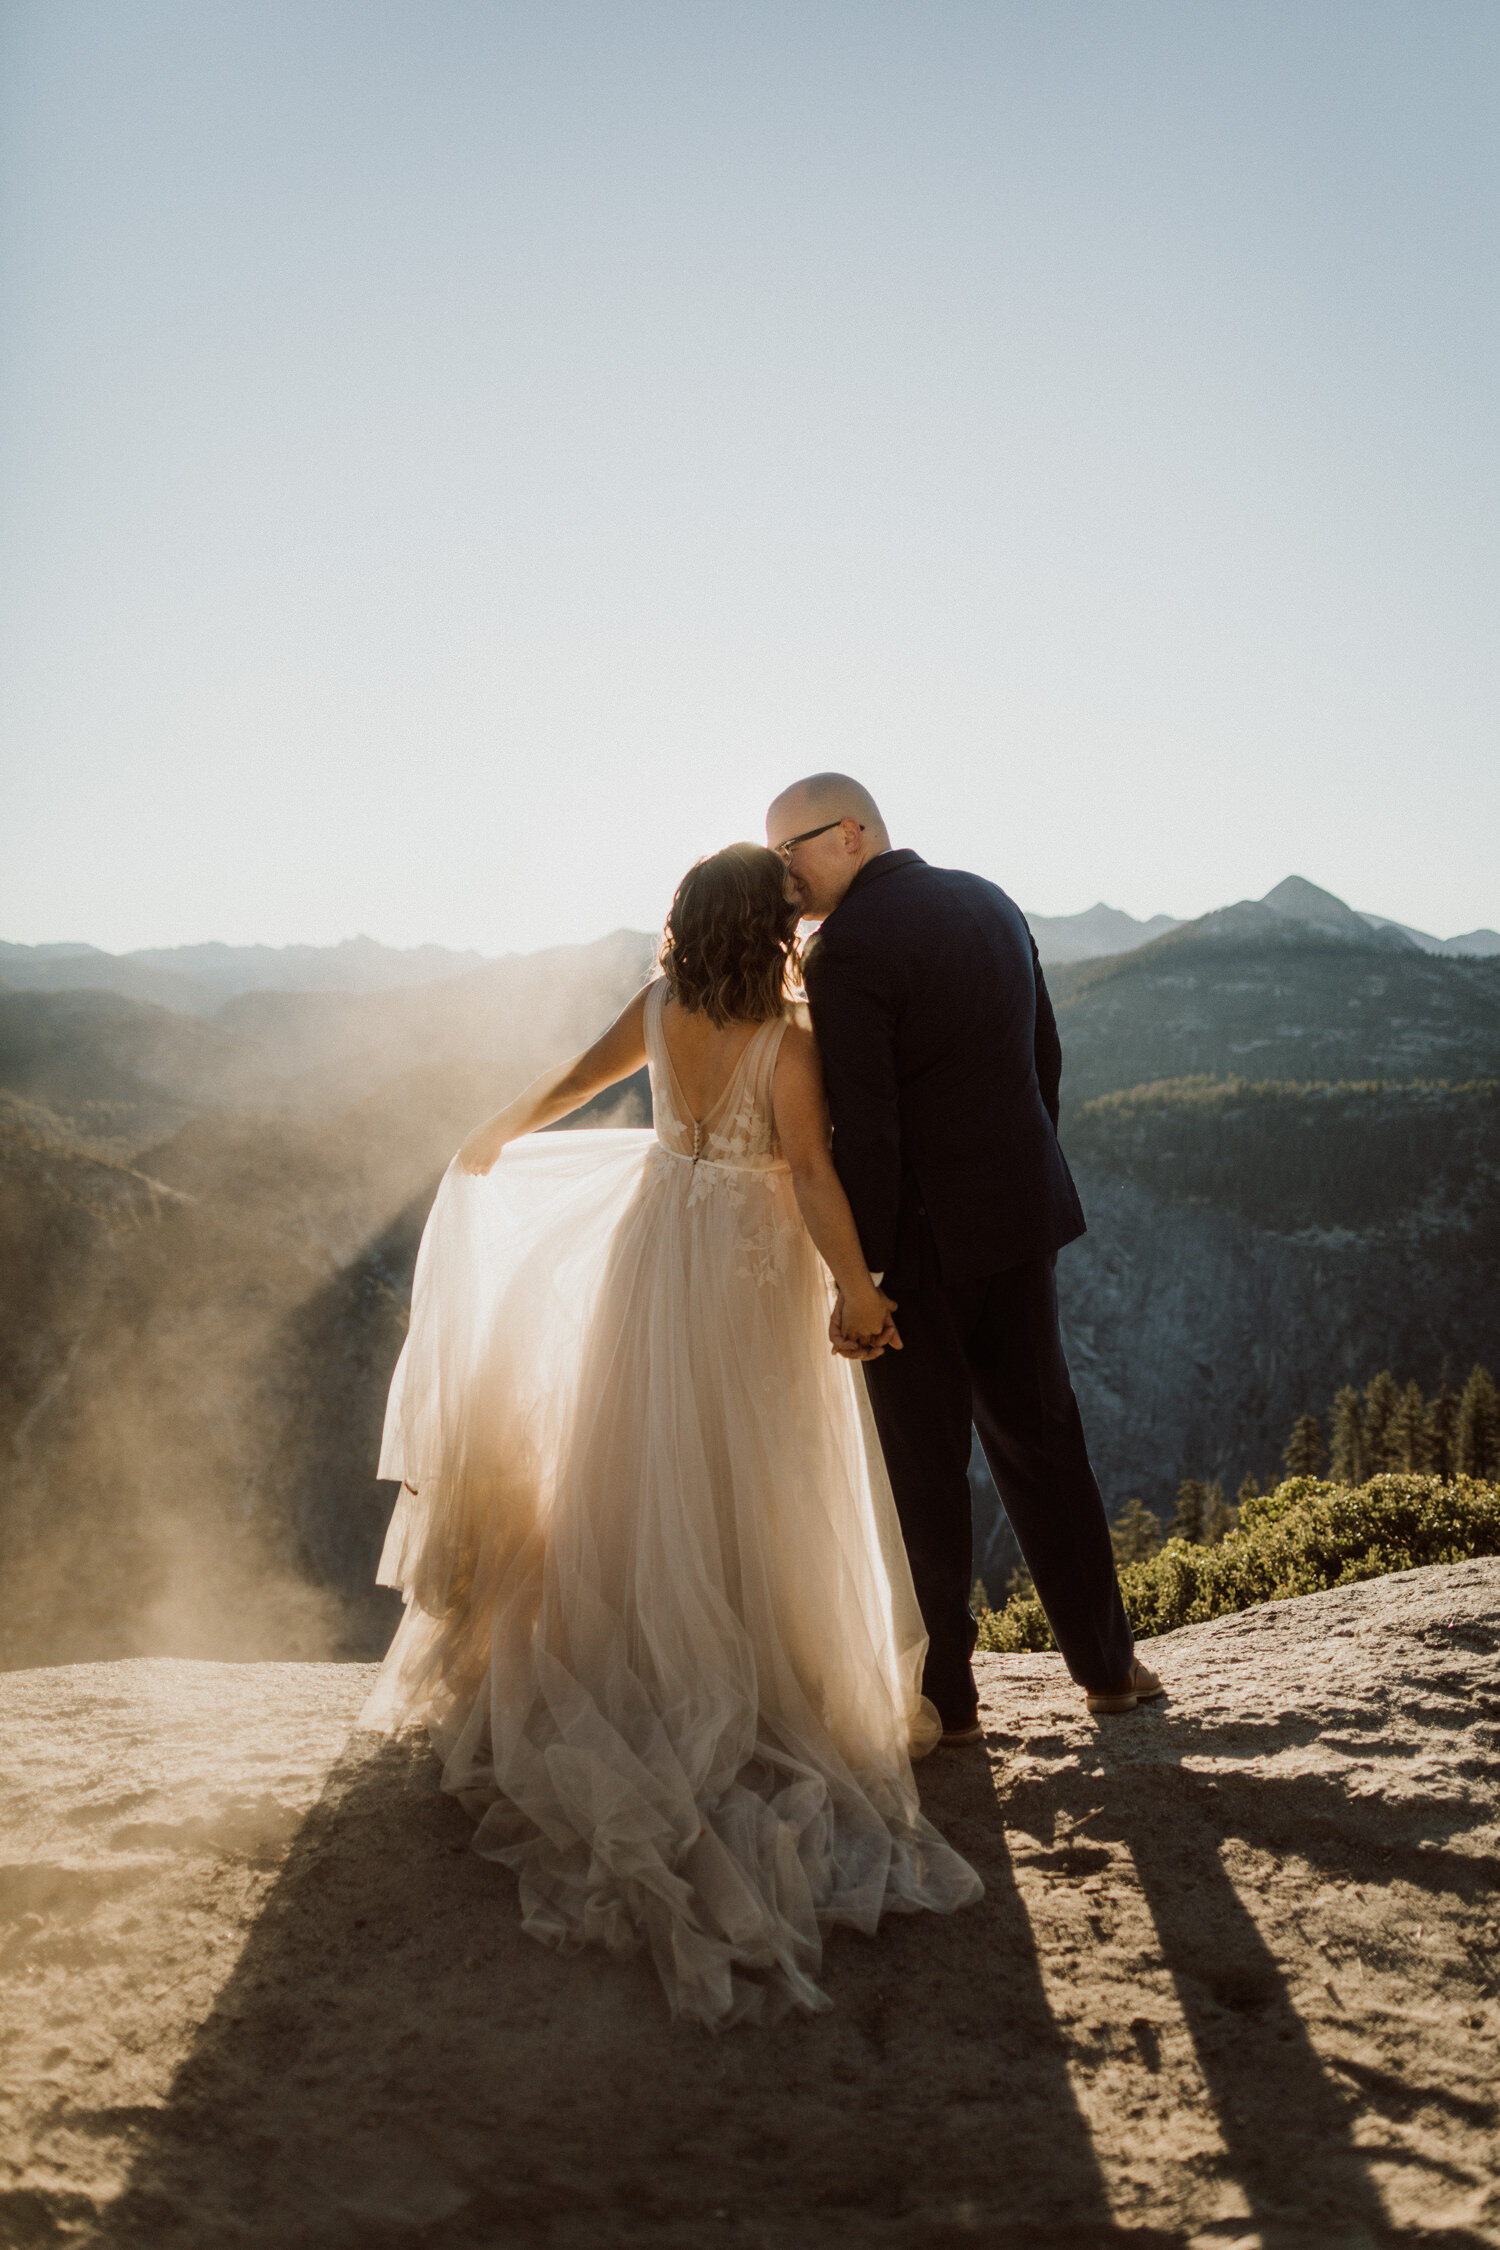 adventure-wedding-yosemite-national-park-9.jpg